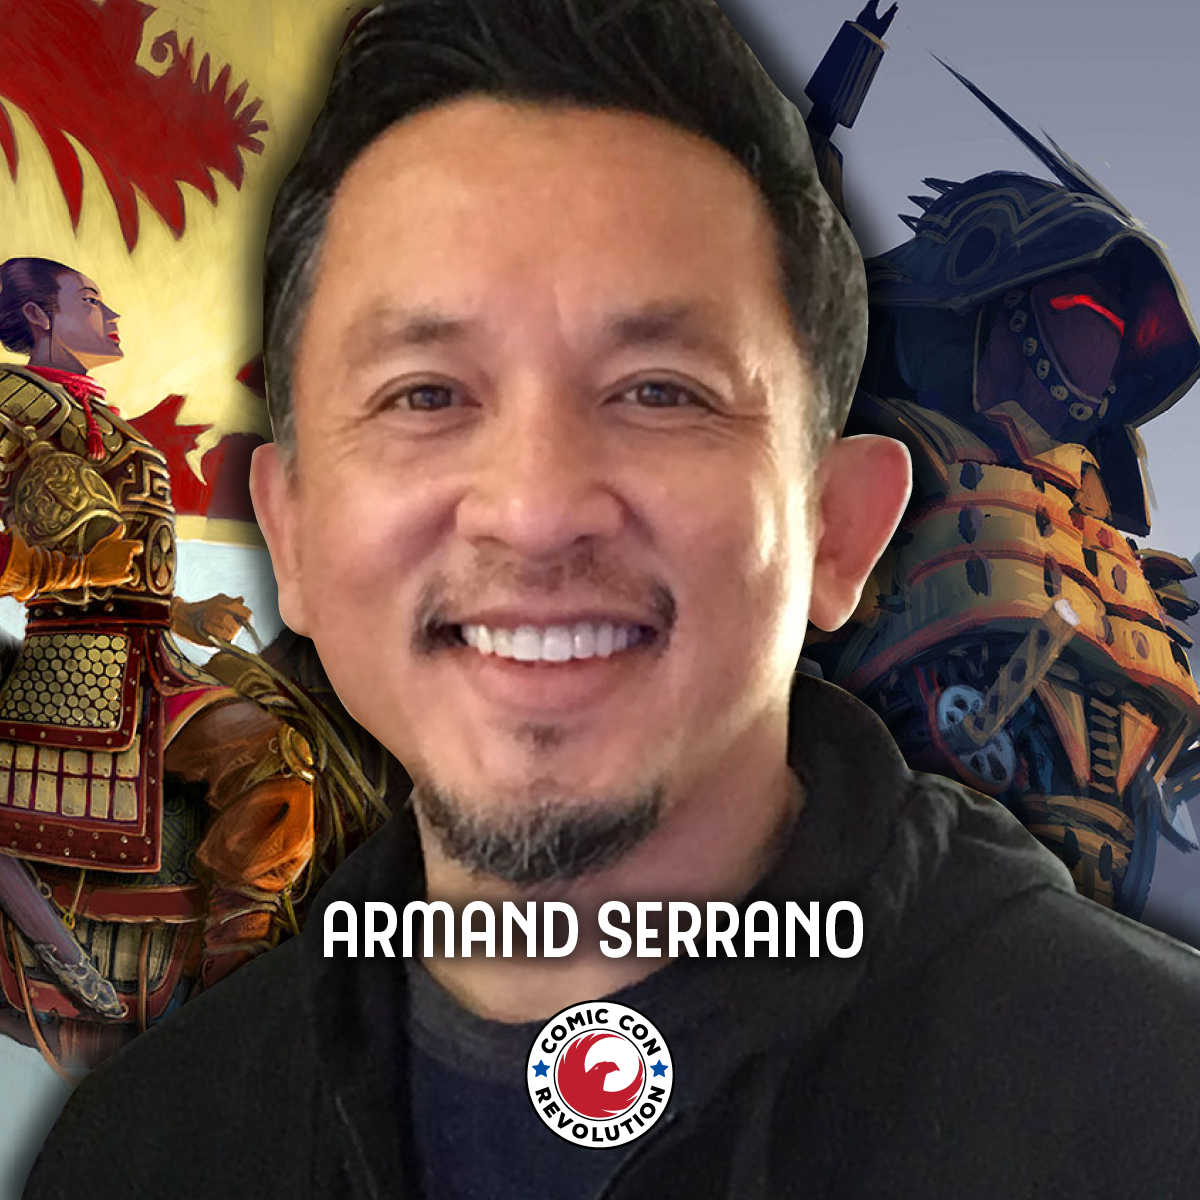 ARMAND SERRANO - Mulan, Blizzard Entertainment, Big Hero 6, Zootopia